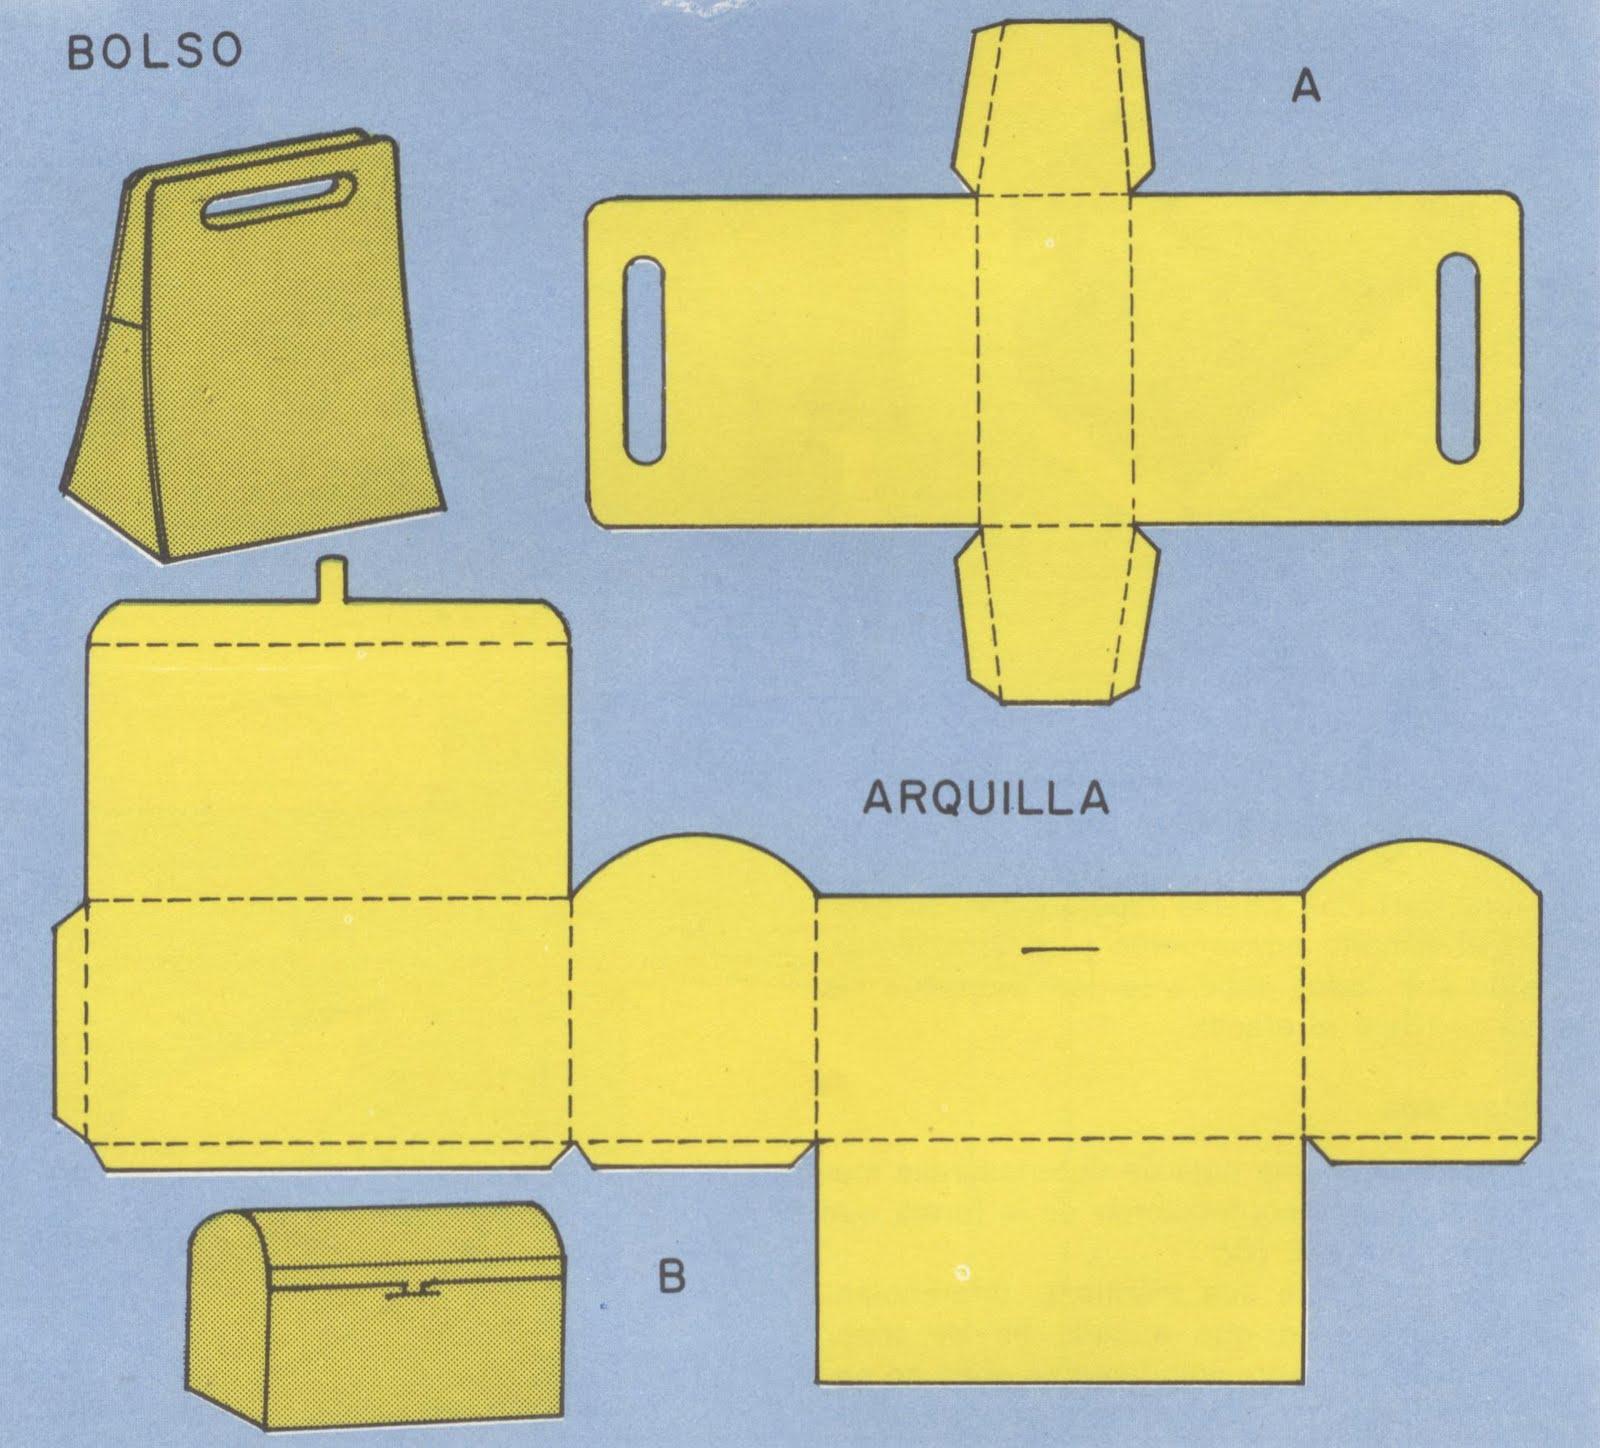 Manualidades infantiles hacer bolsa de papel - Hacer bolsas de papel en casa ...